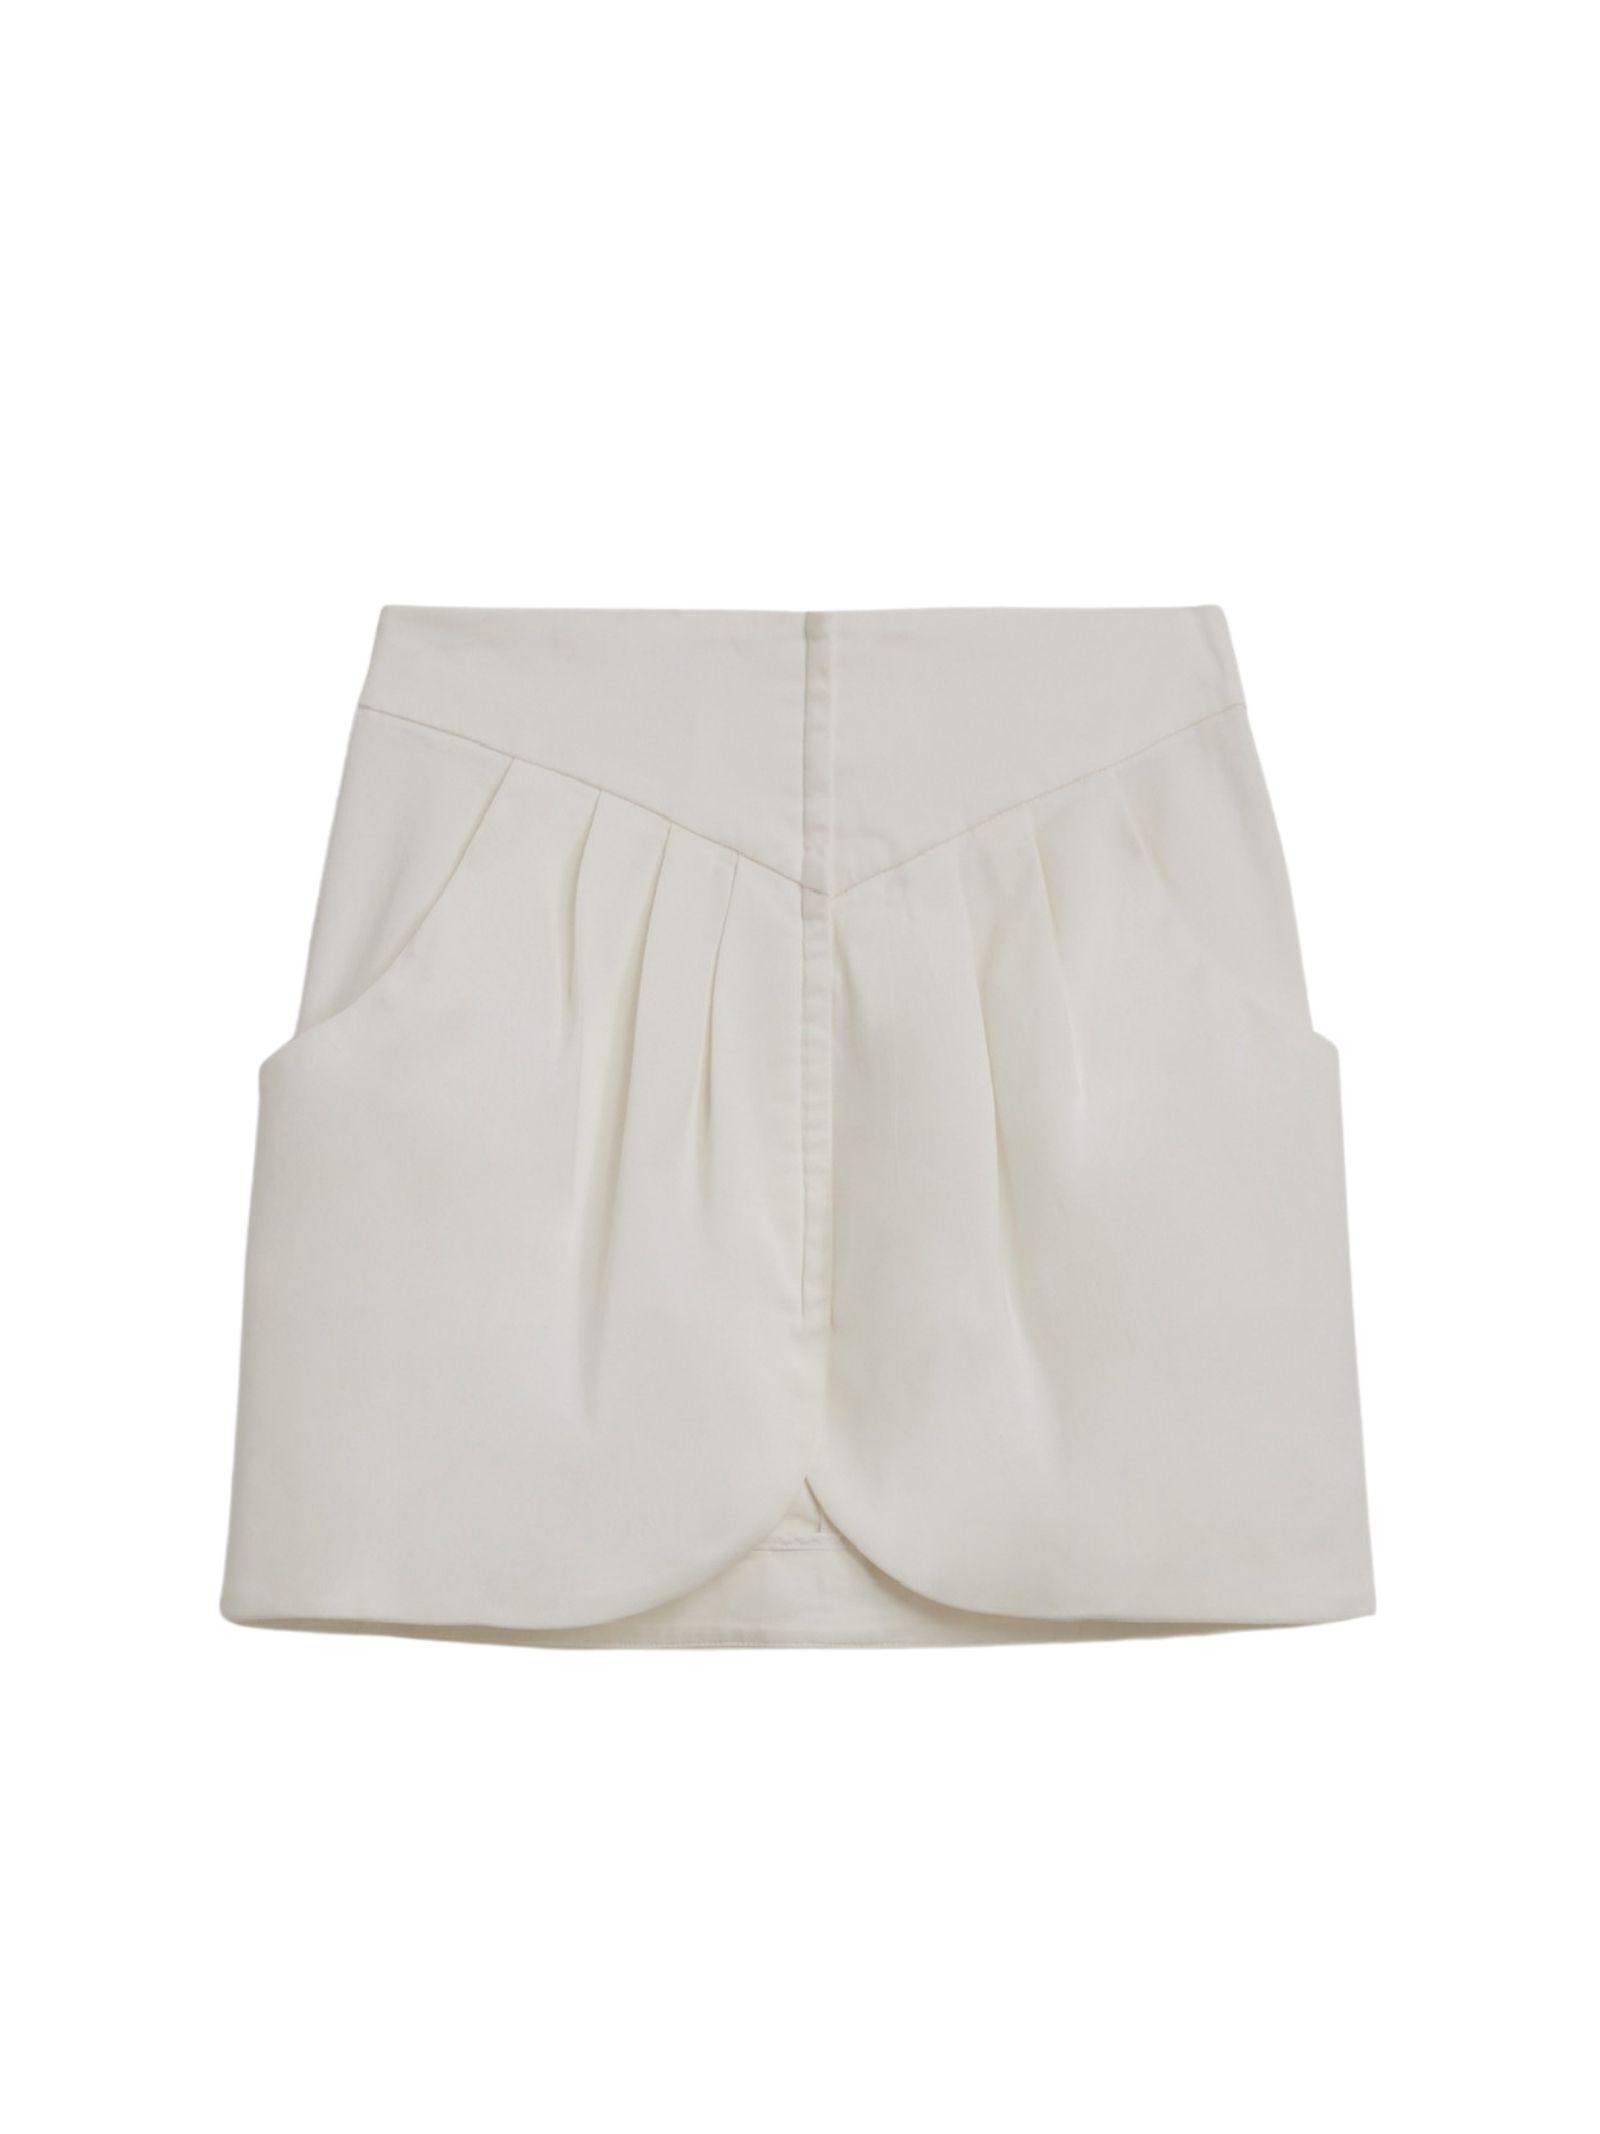 Minigonna bianca a vita alta DONDUP | Gonna | G485 GSE045DPTD 001